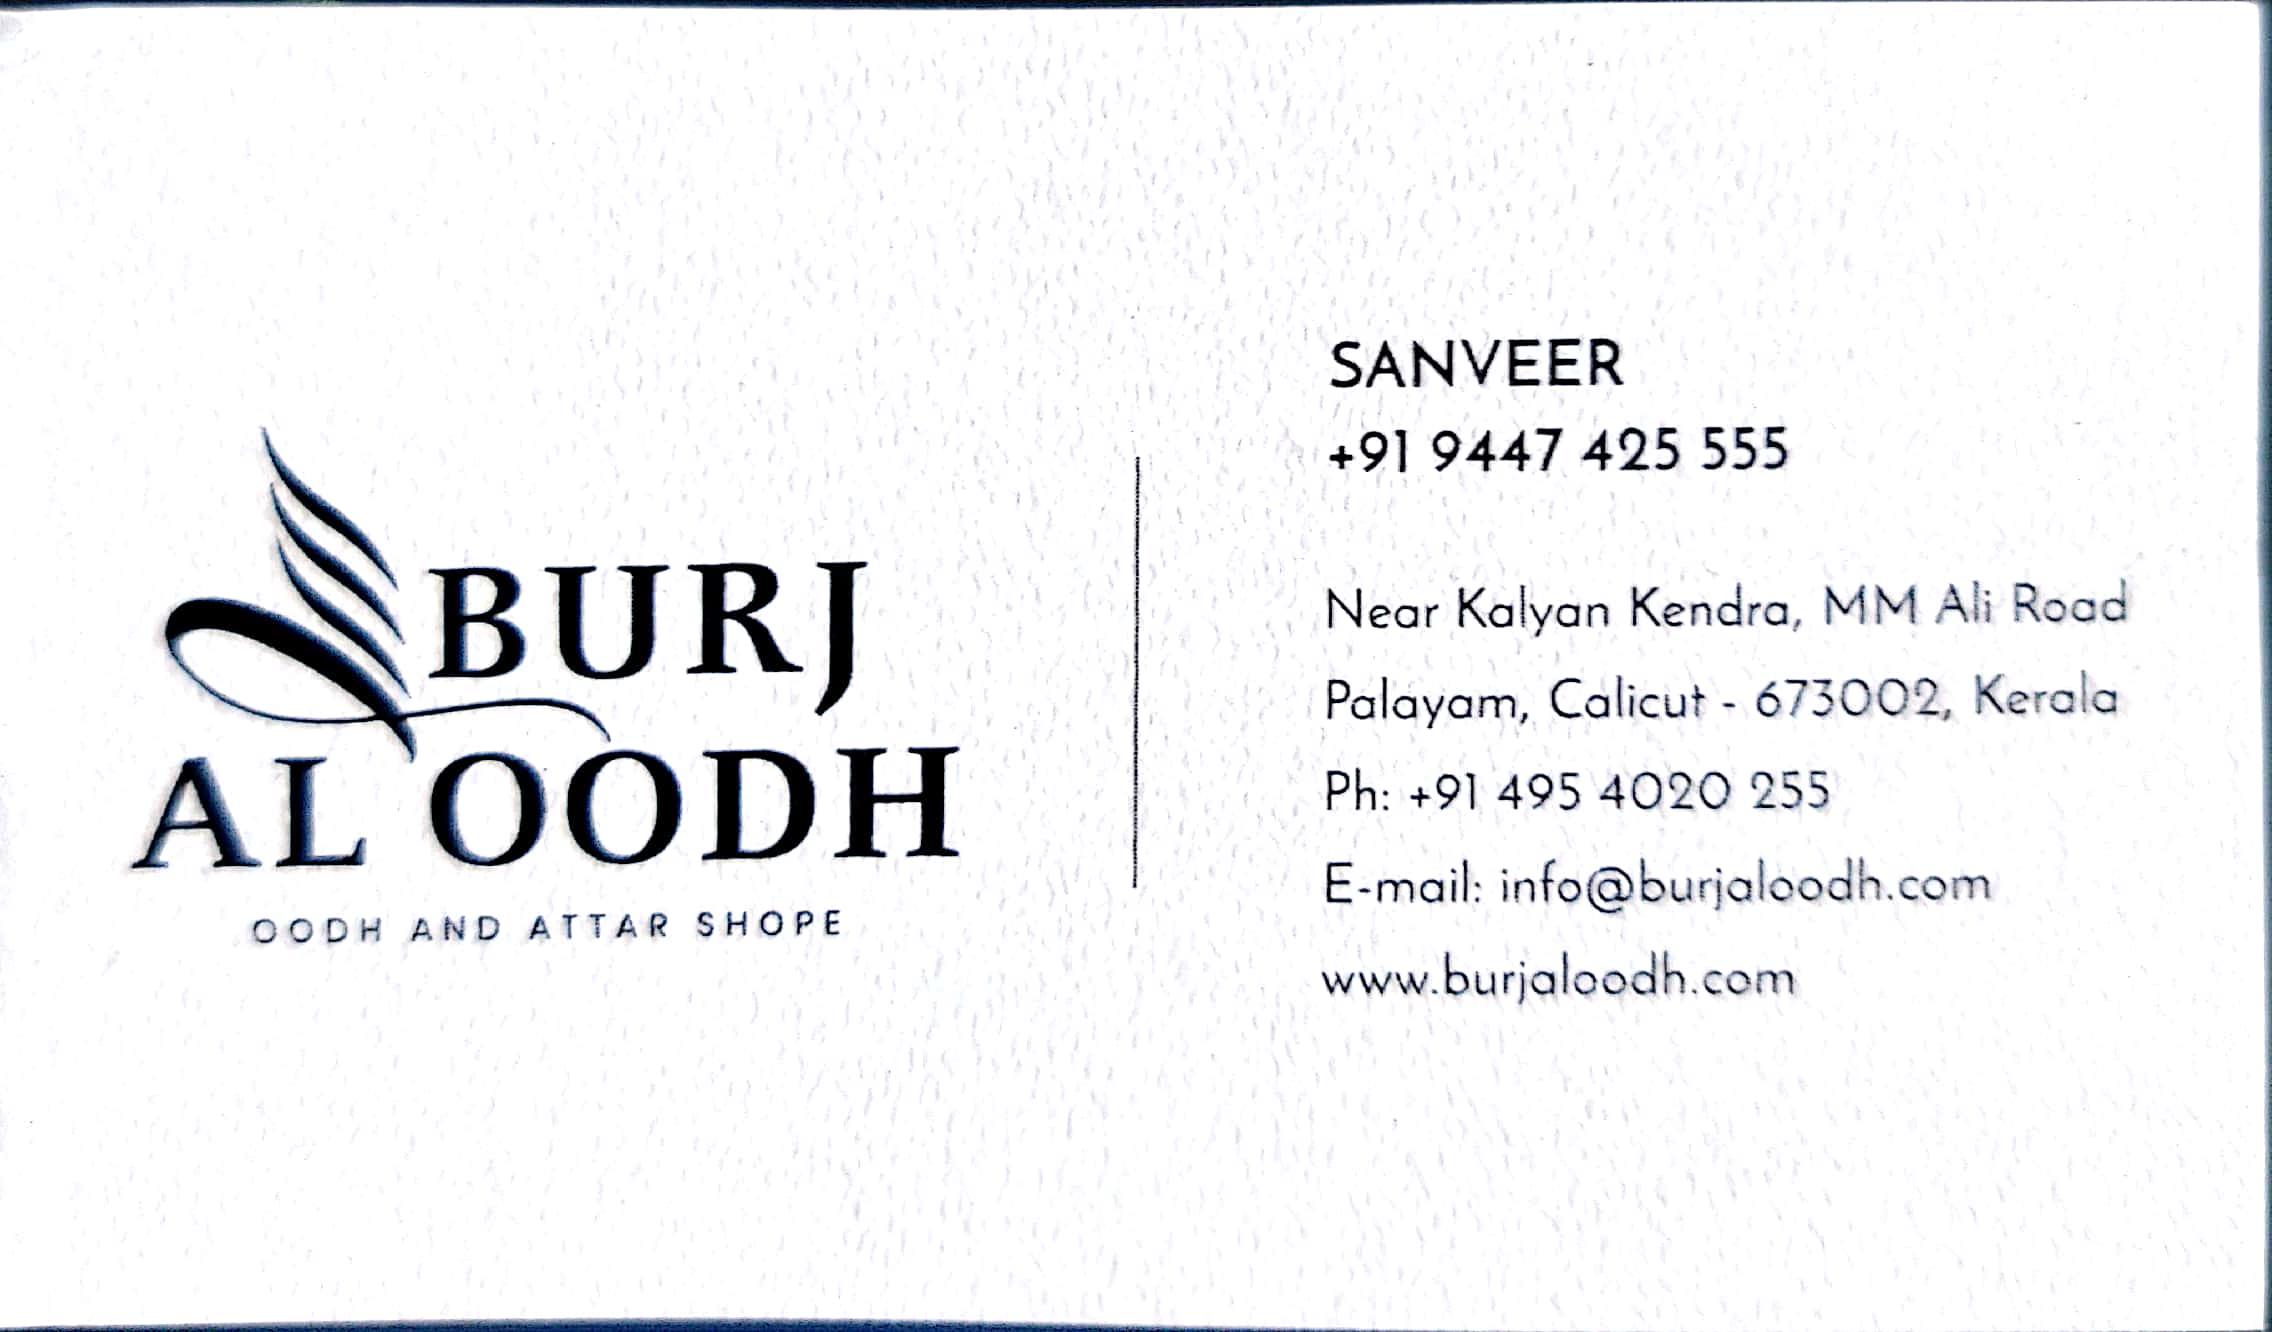 BURJ AL OODH, OUDH & ATTAR,  service in Kozhikode Town, Kozhikode